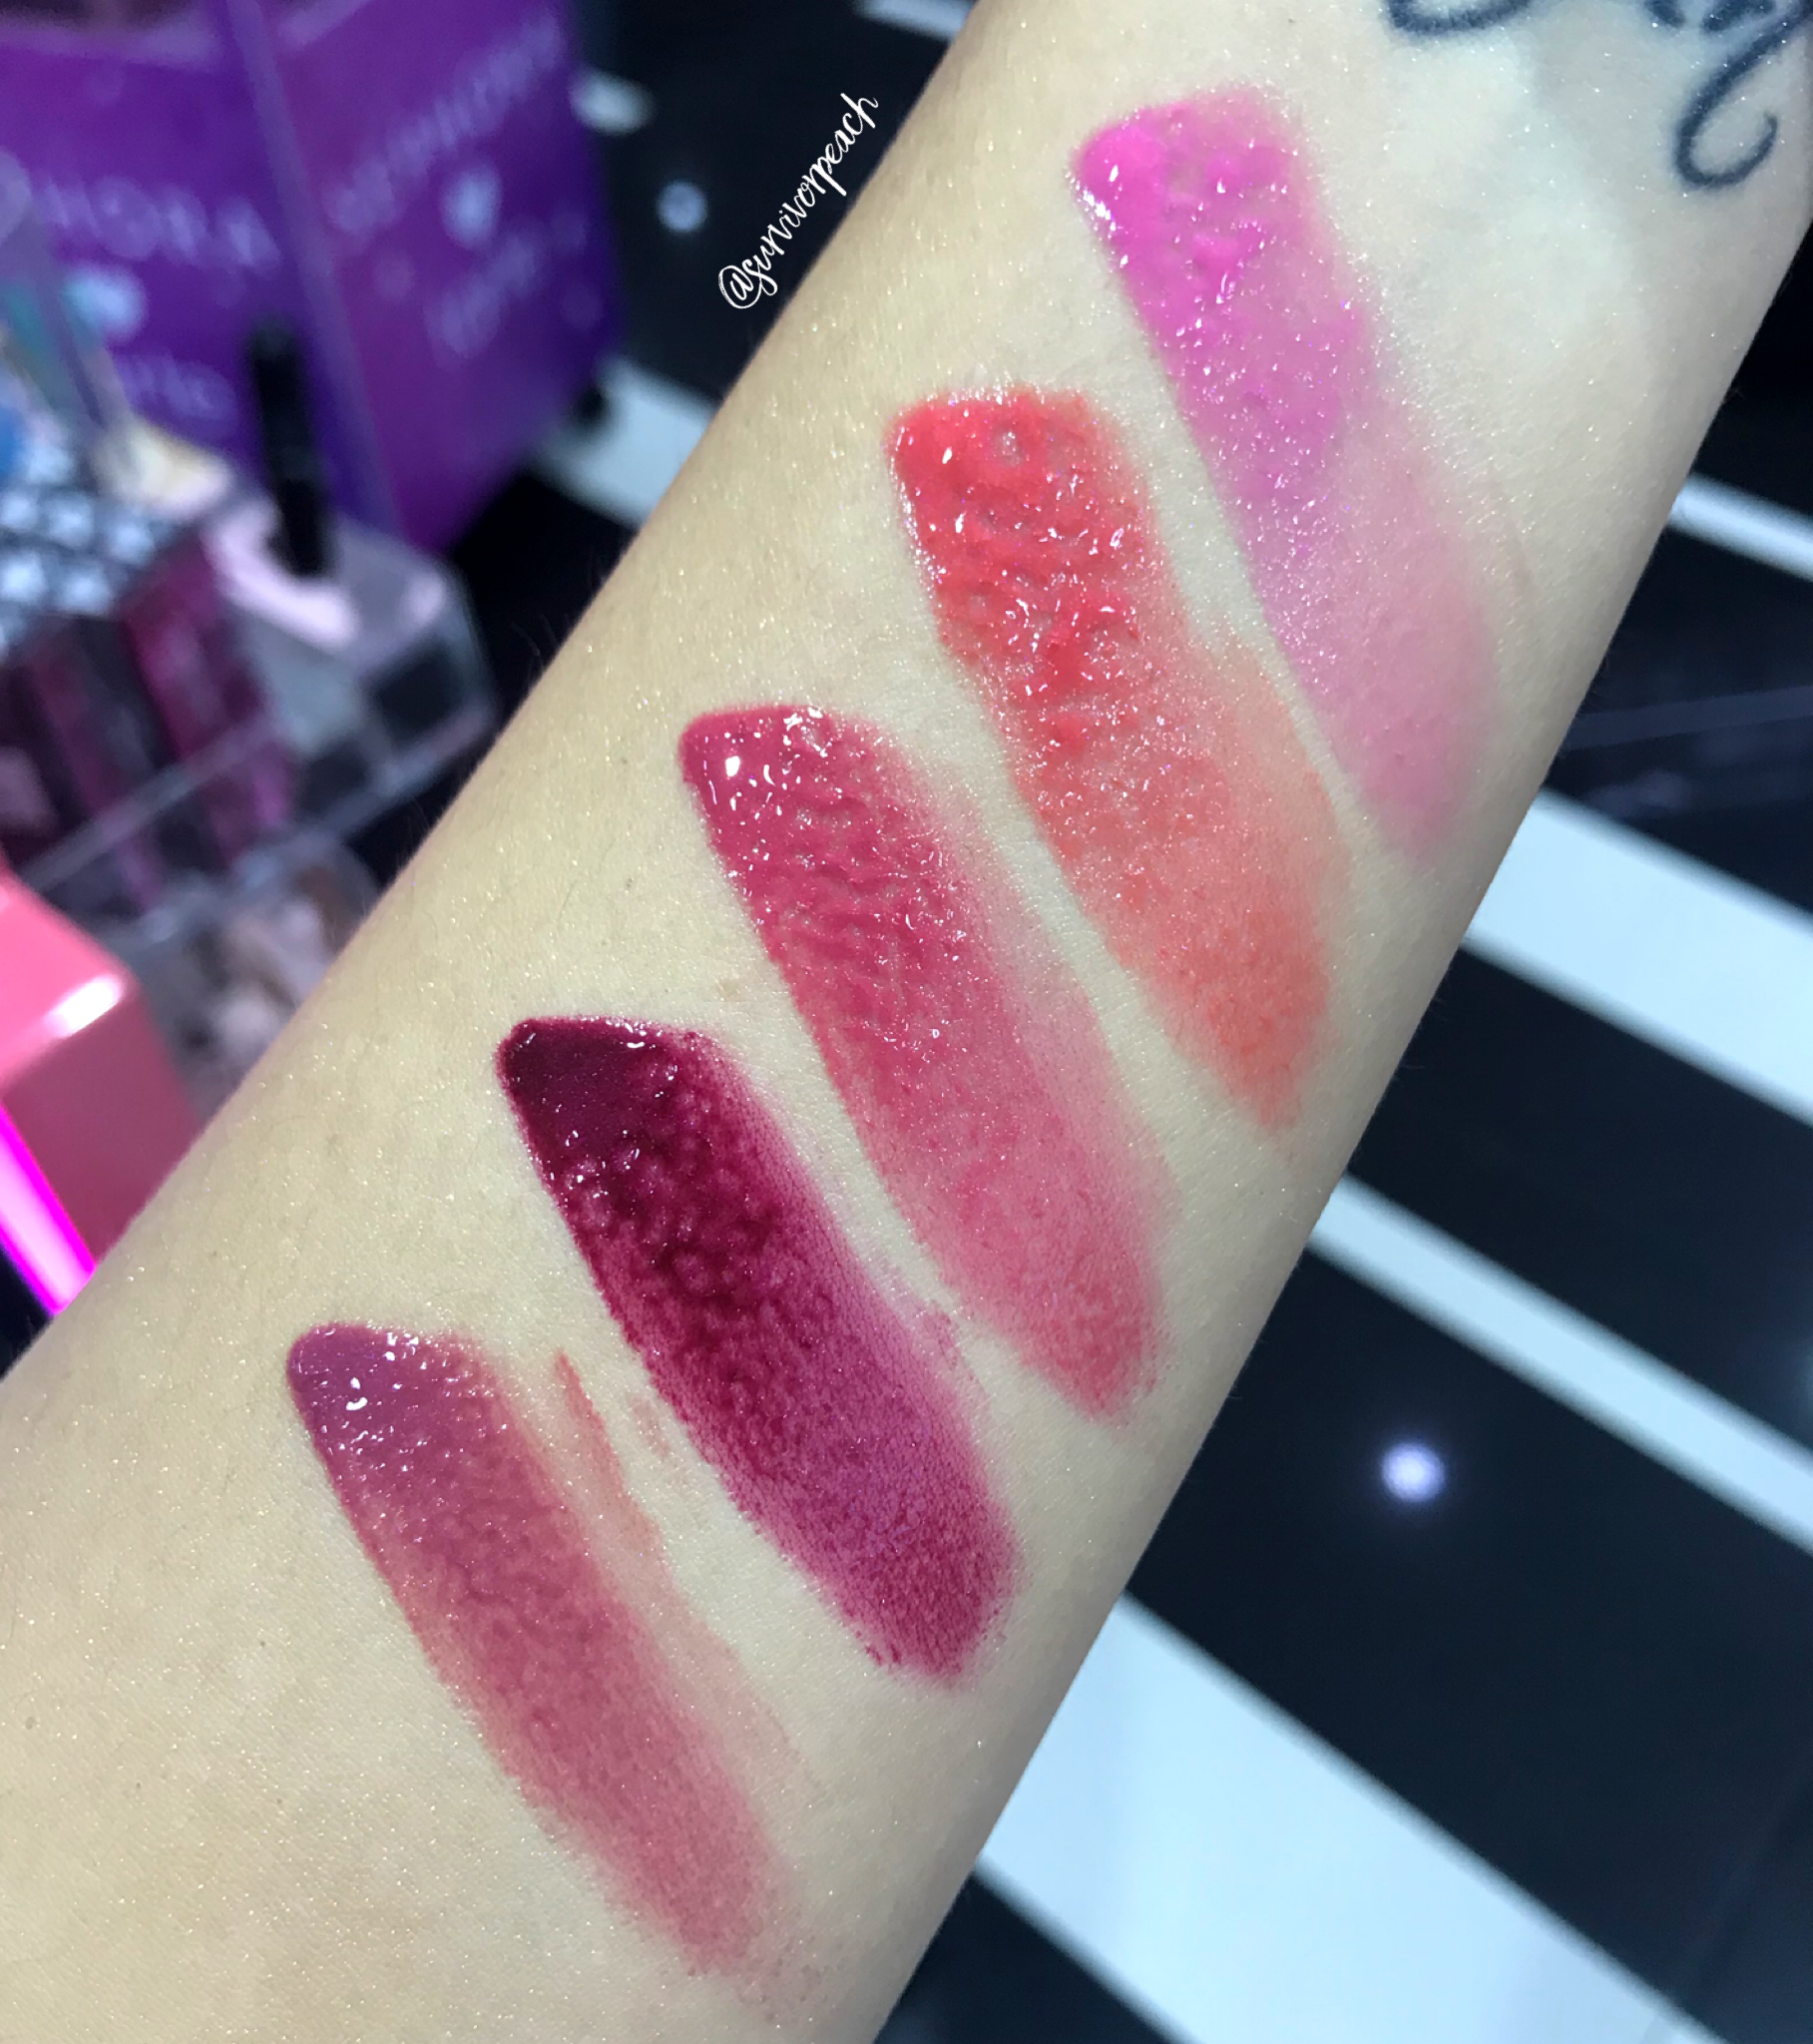 Becca Glow Gloss swatches: Camellia, Tigerlily, Snapdragon, Foxglove, Dahlia